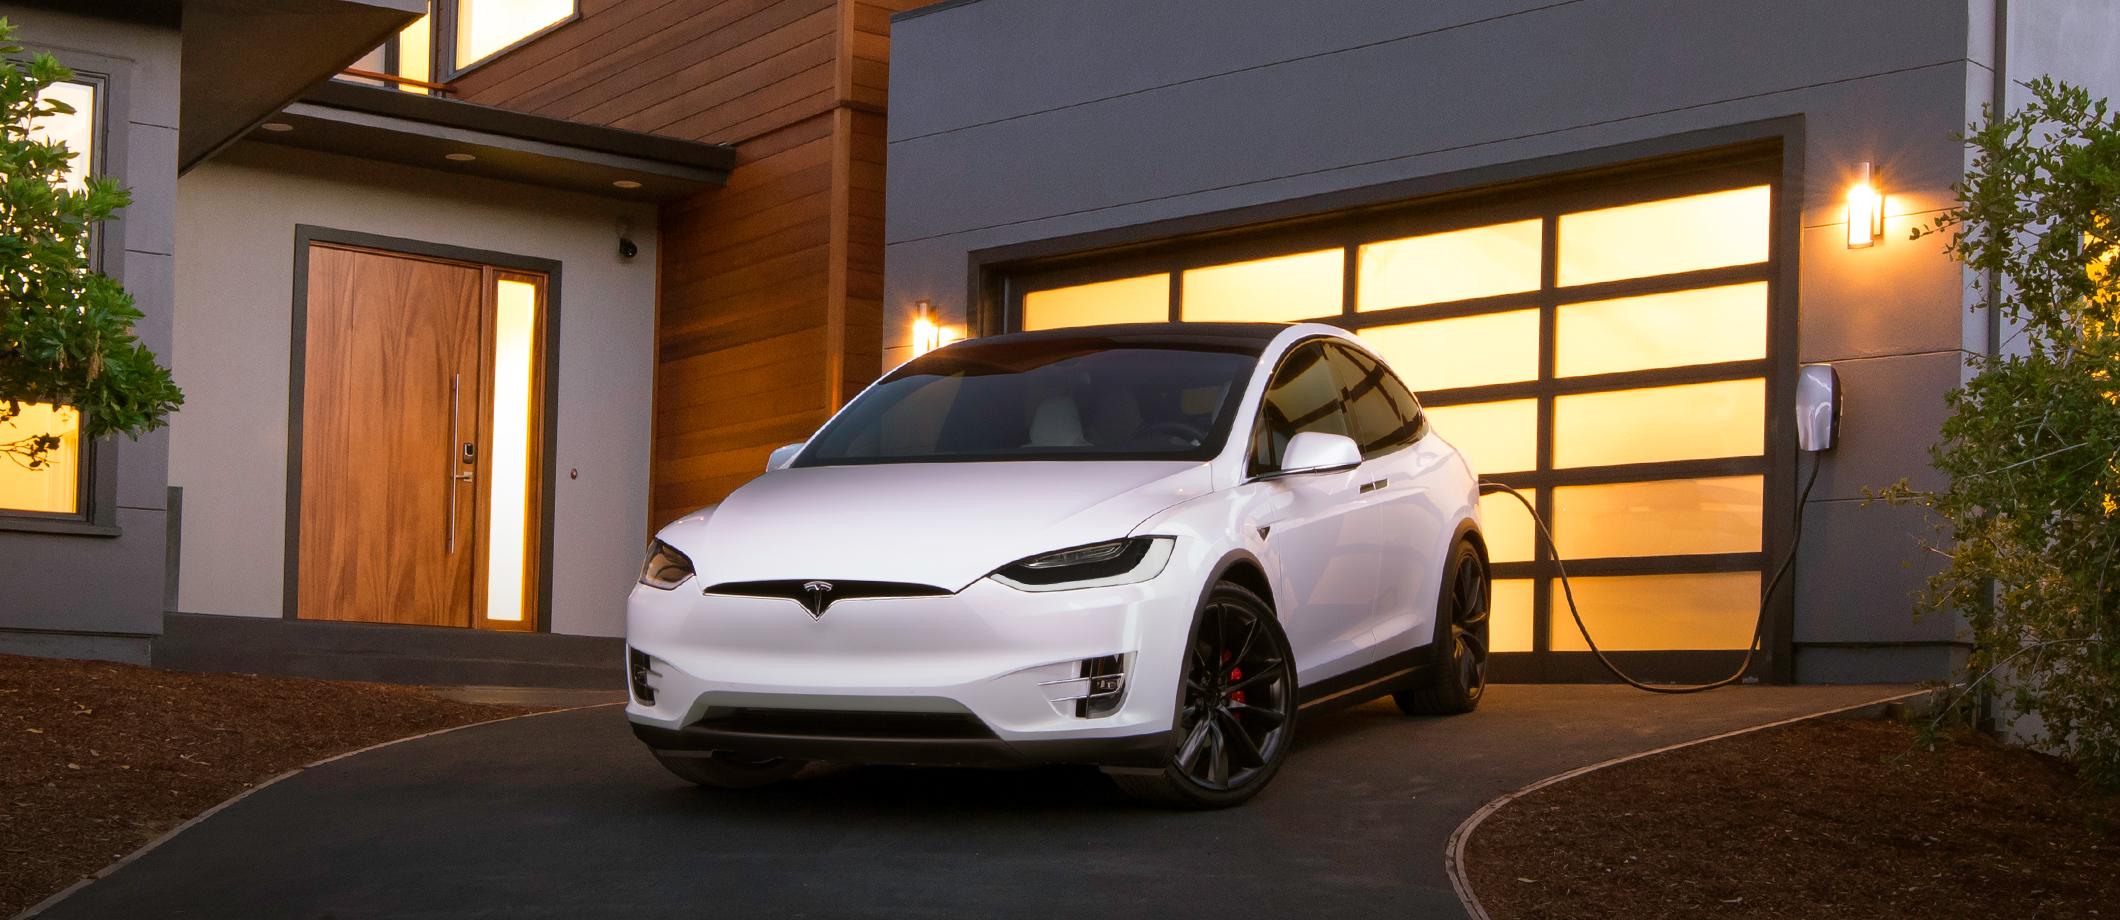 California Hybrid Rebate >> Southern California Edison offers $450 credit to any EV/PHEV drivers - Electrek